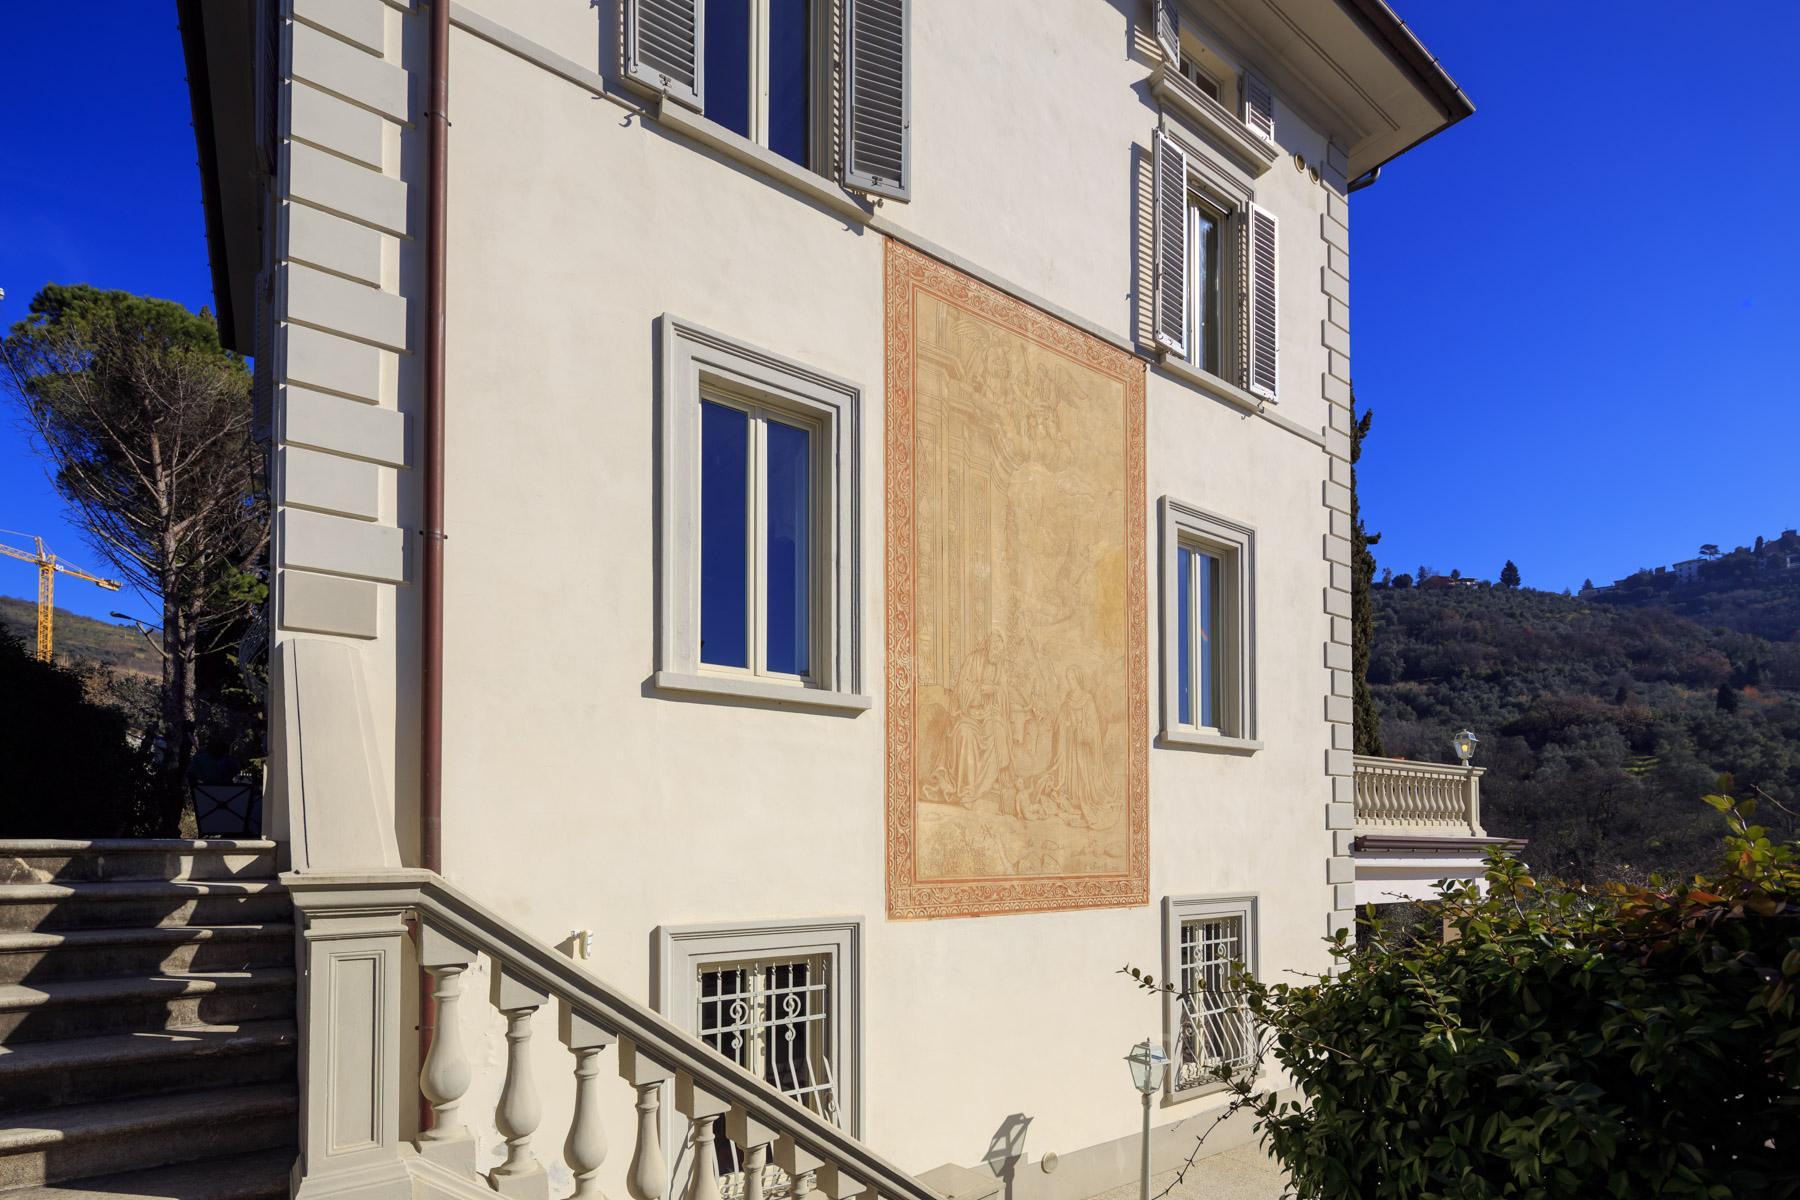 Montecatini Terme小镇优雅的新艺术风格的别墅 - 29